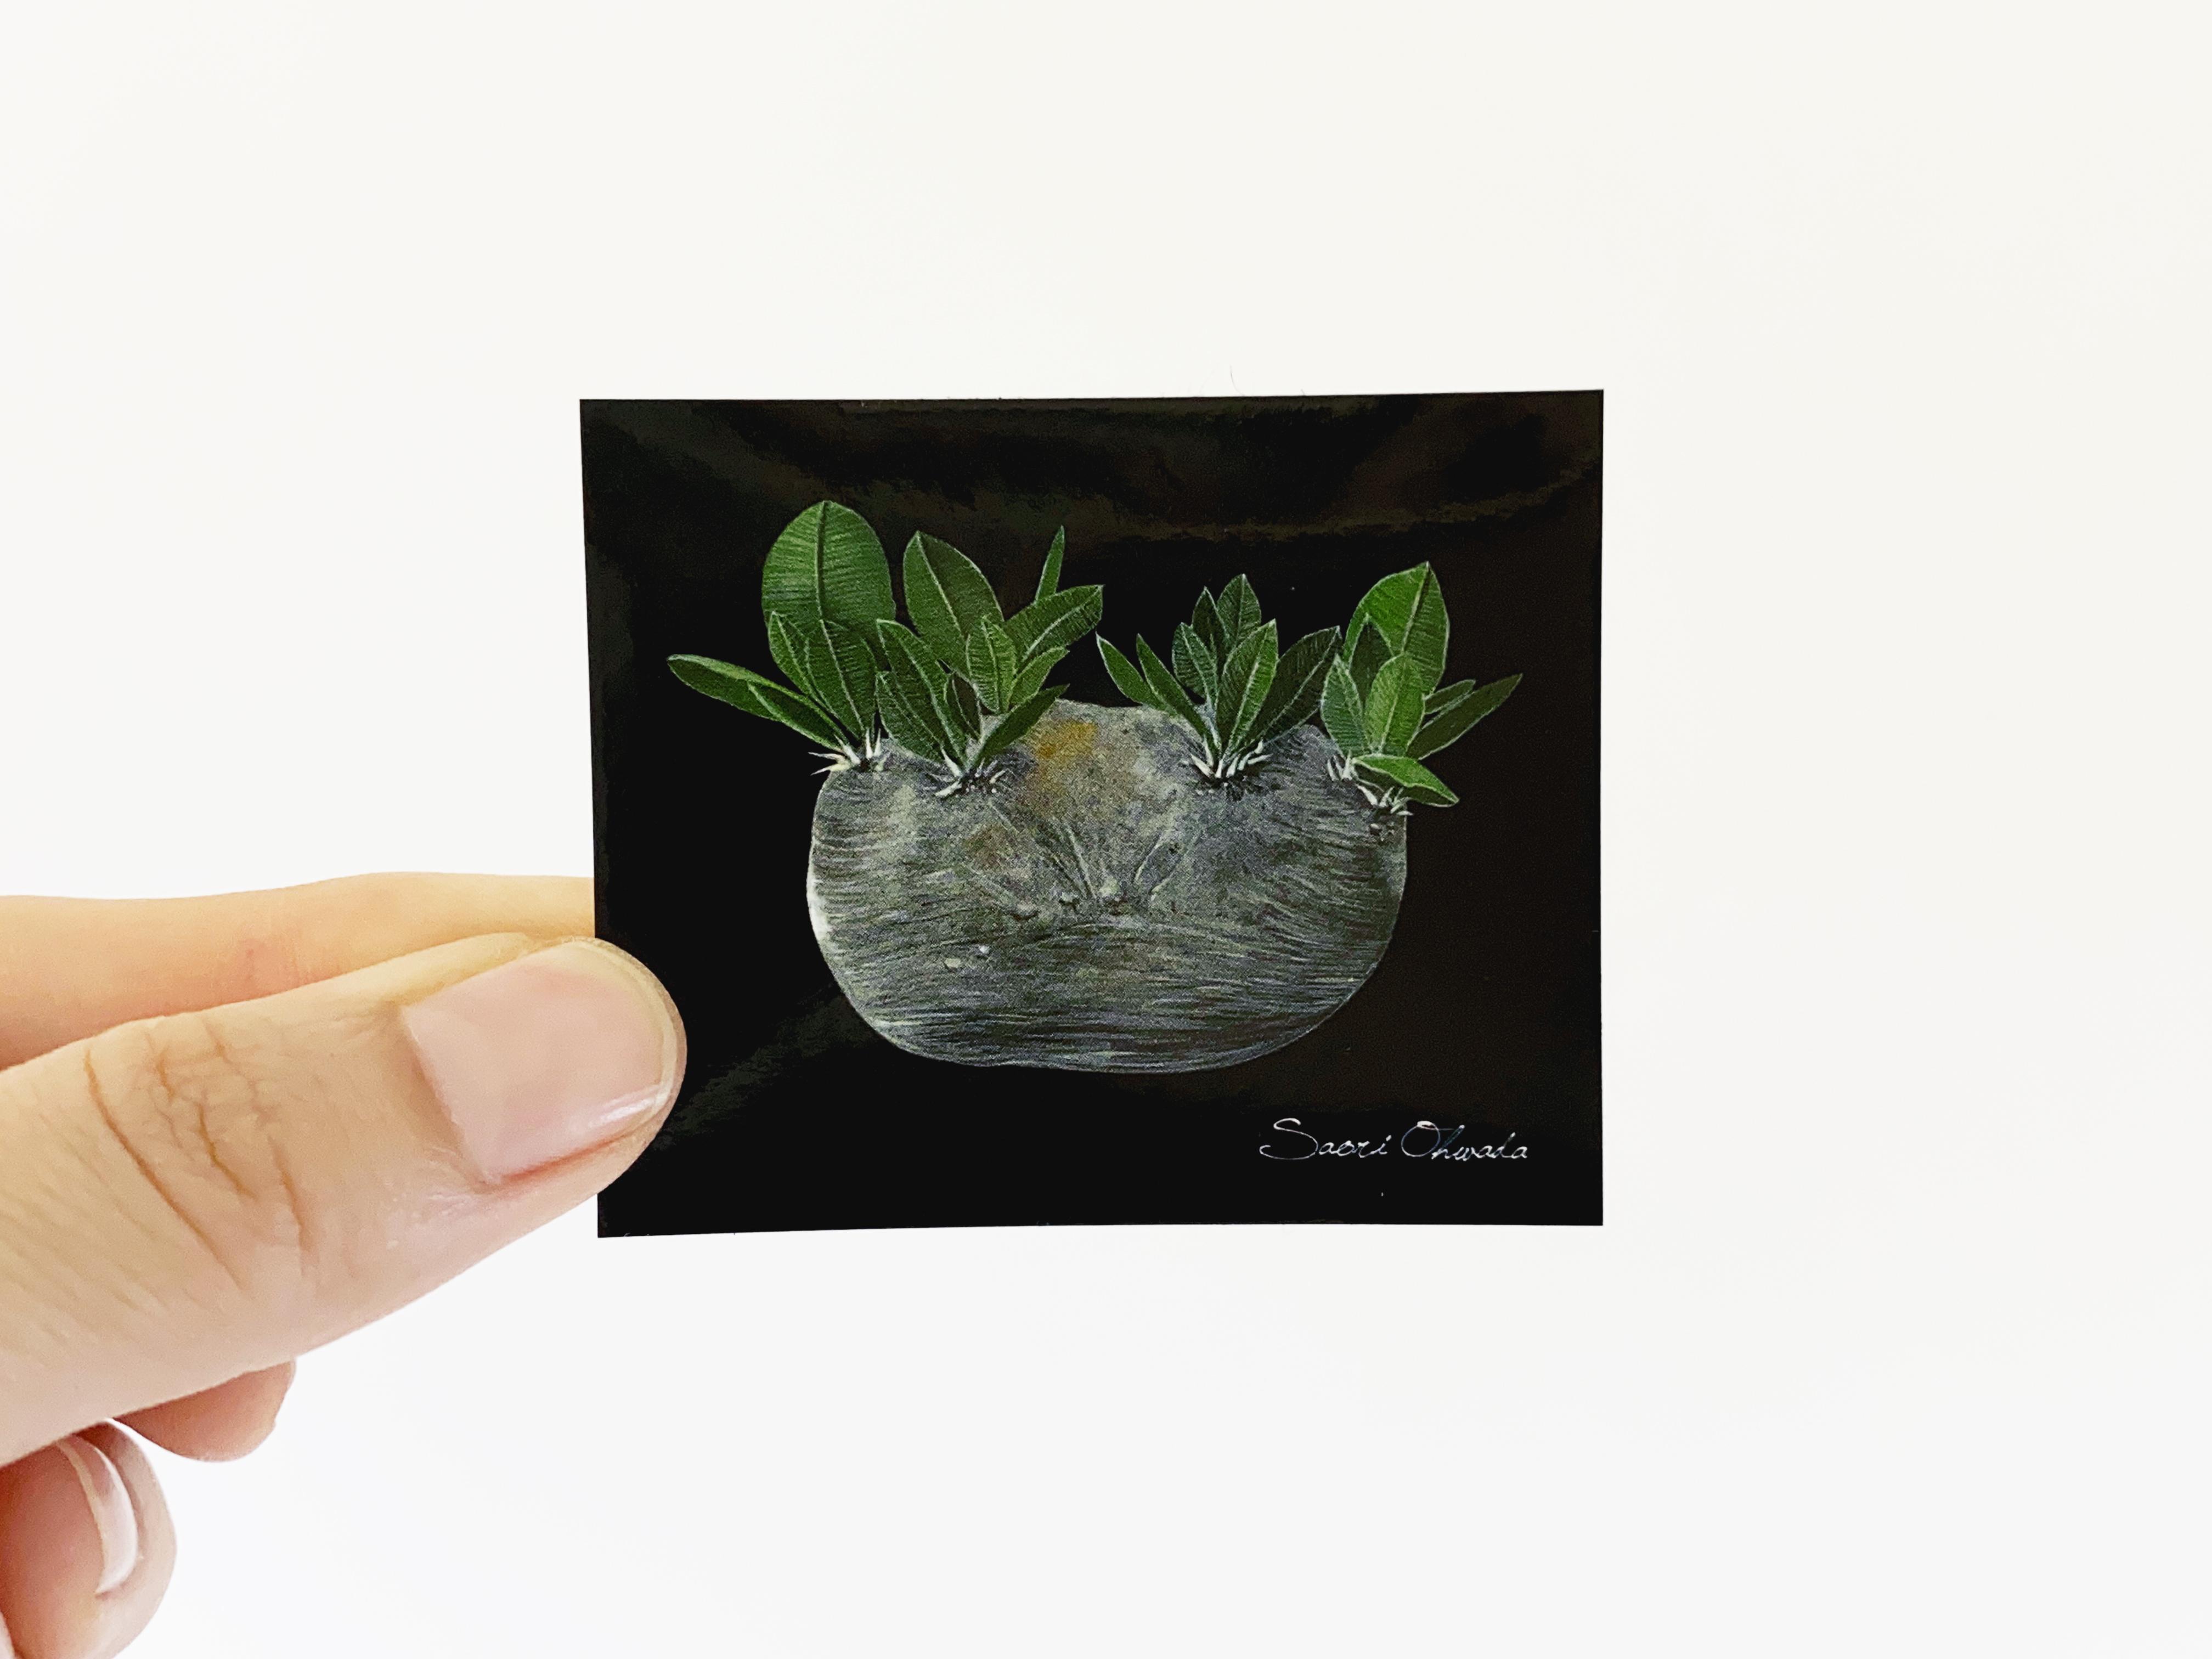 Pachypodium brevicaule ステッカー